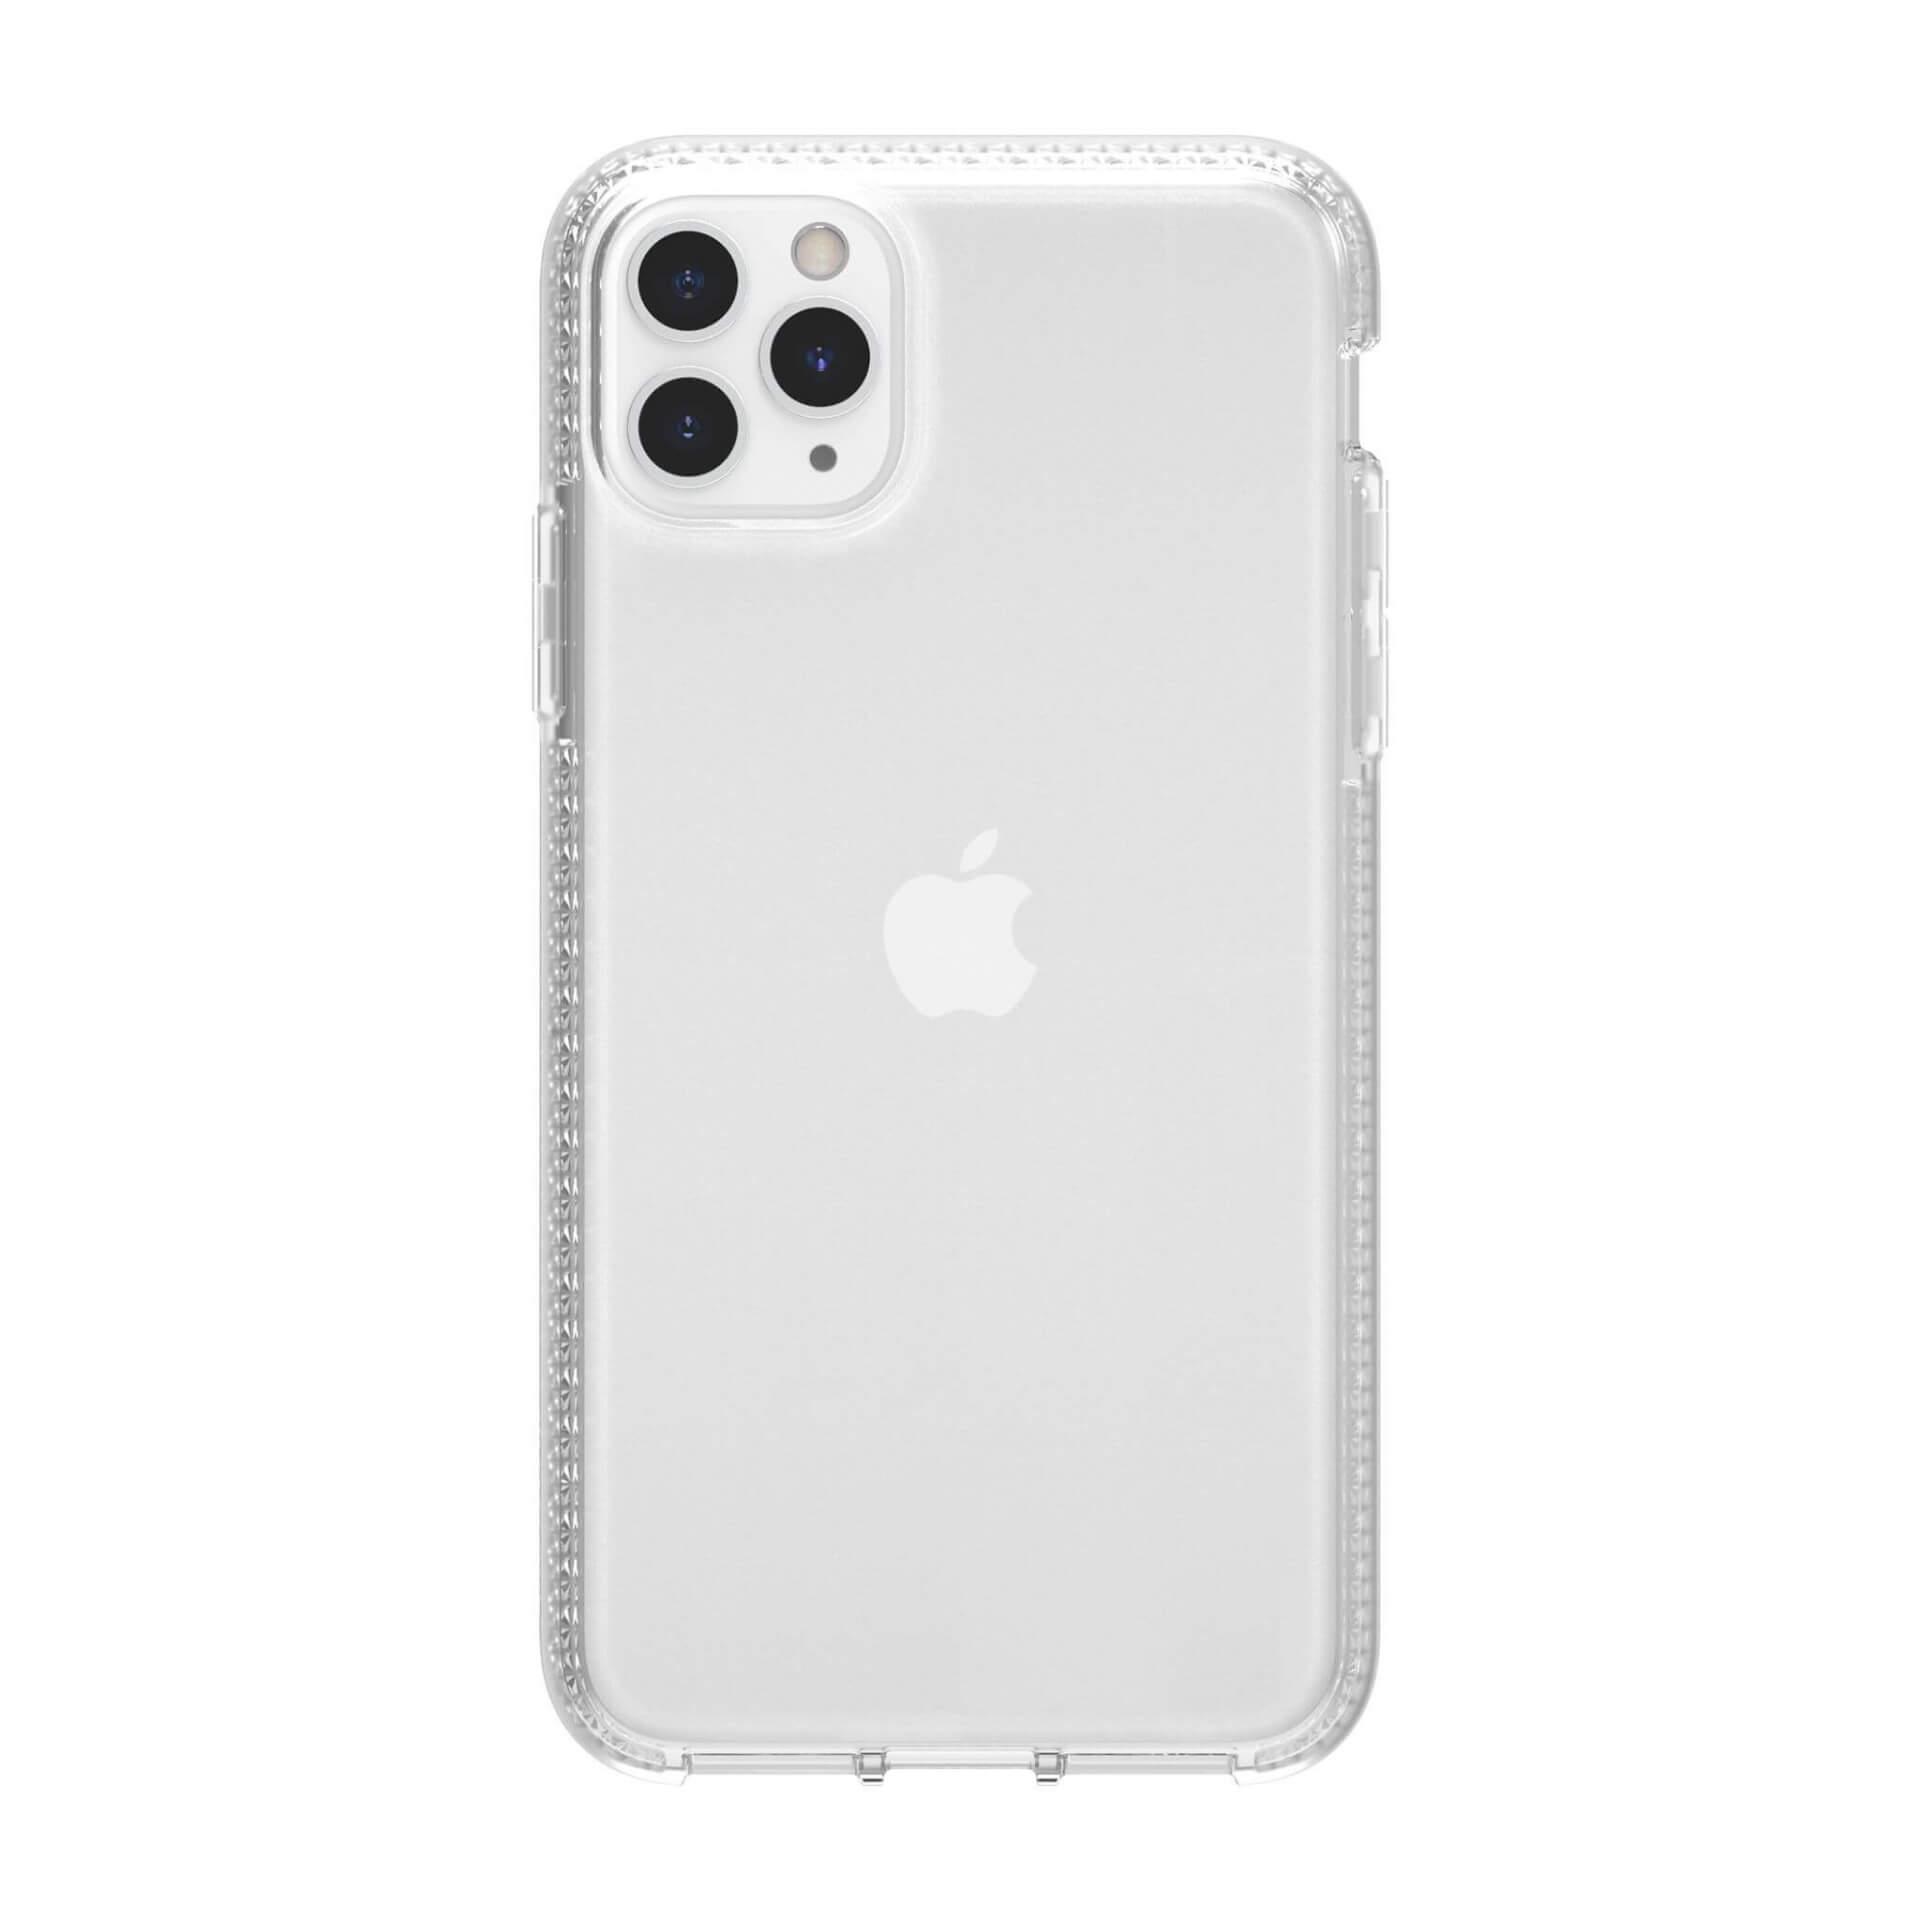 Griffin Survivor Clear Case — хибриден удароустойчив кейс за iPhone 11 Pro Max (прозрачен) - 1